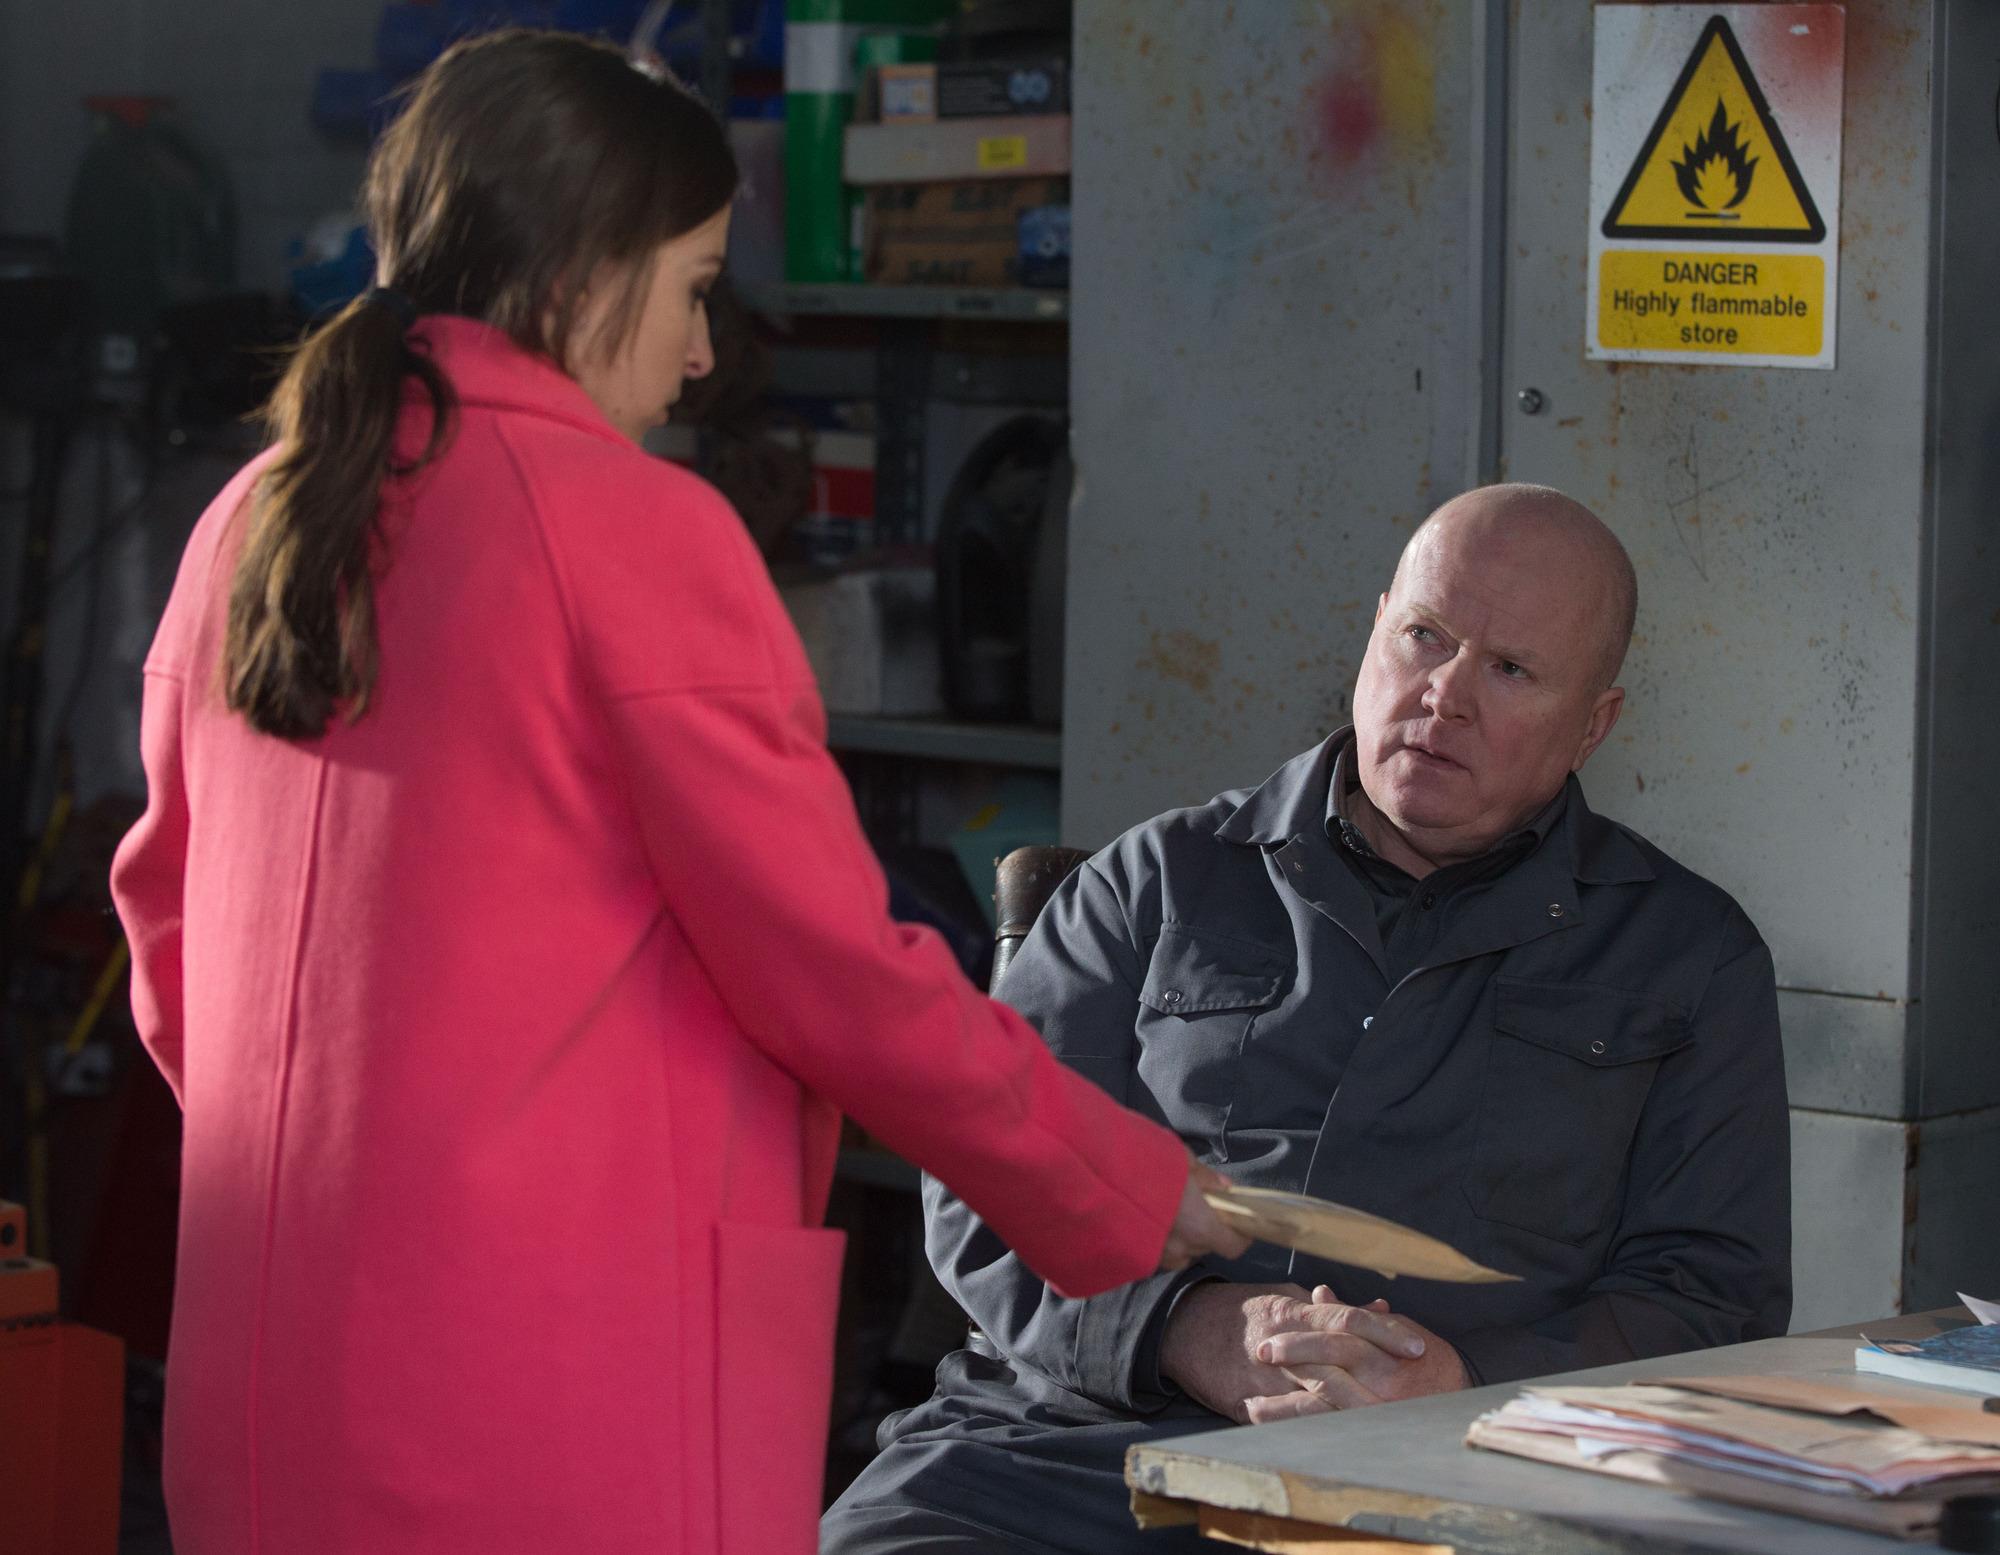 EastEnders spoilers: Phil Mitchell to murder Ruby Allen's rapists?